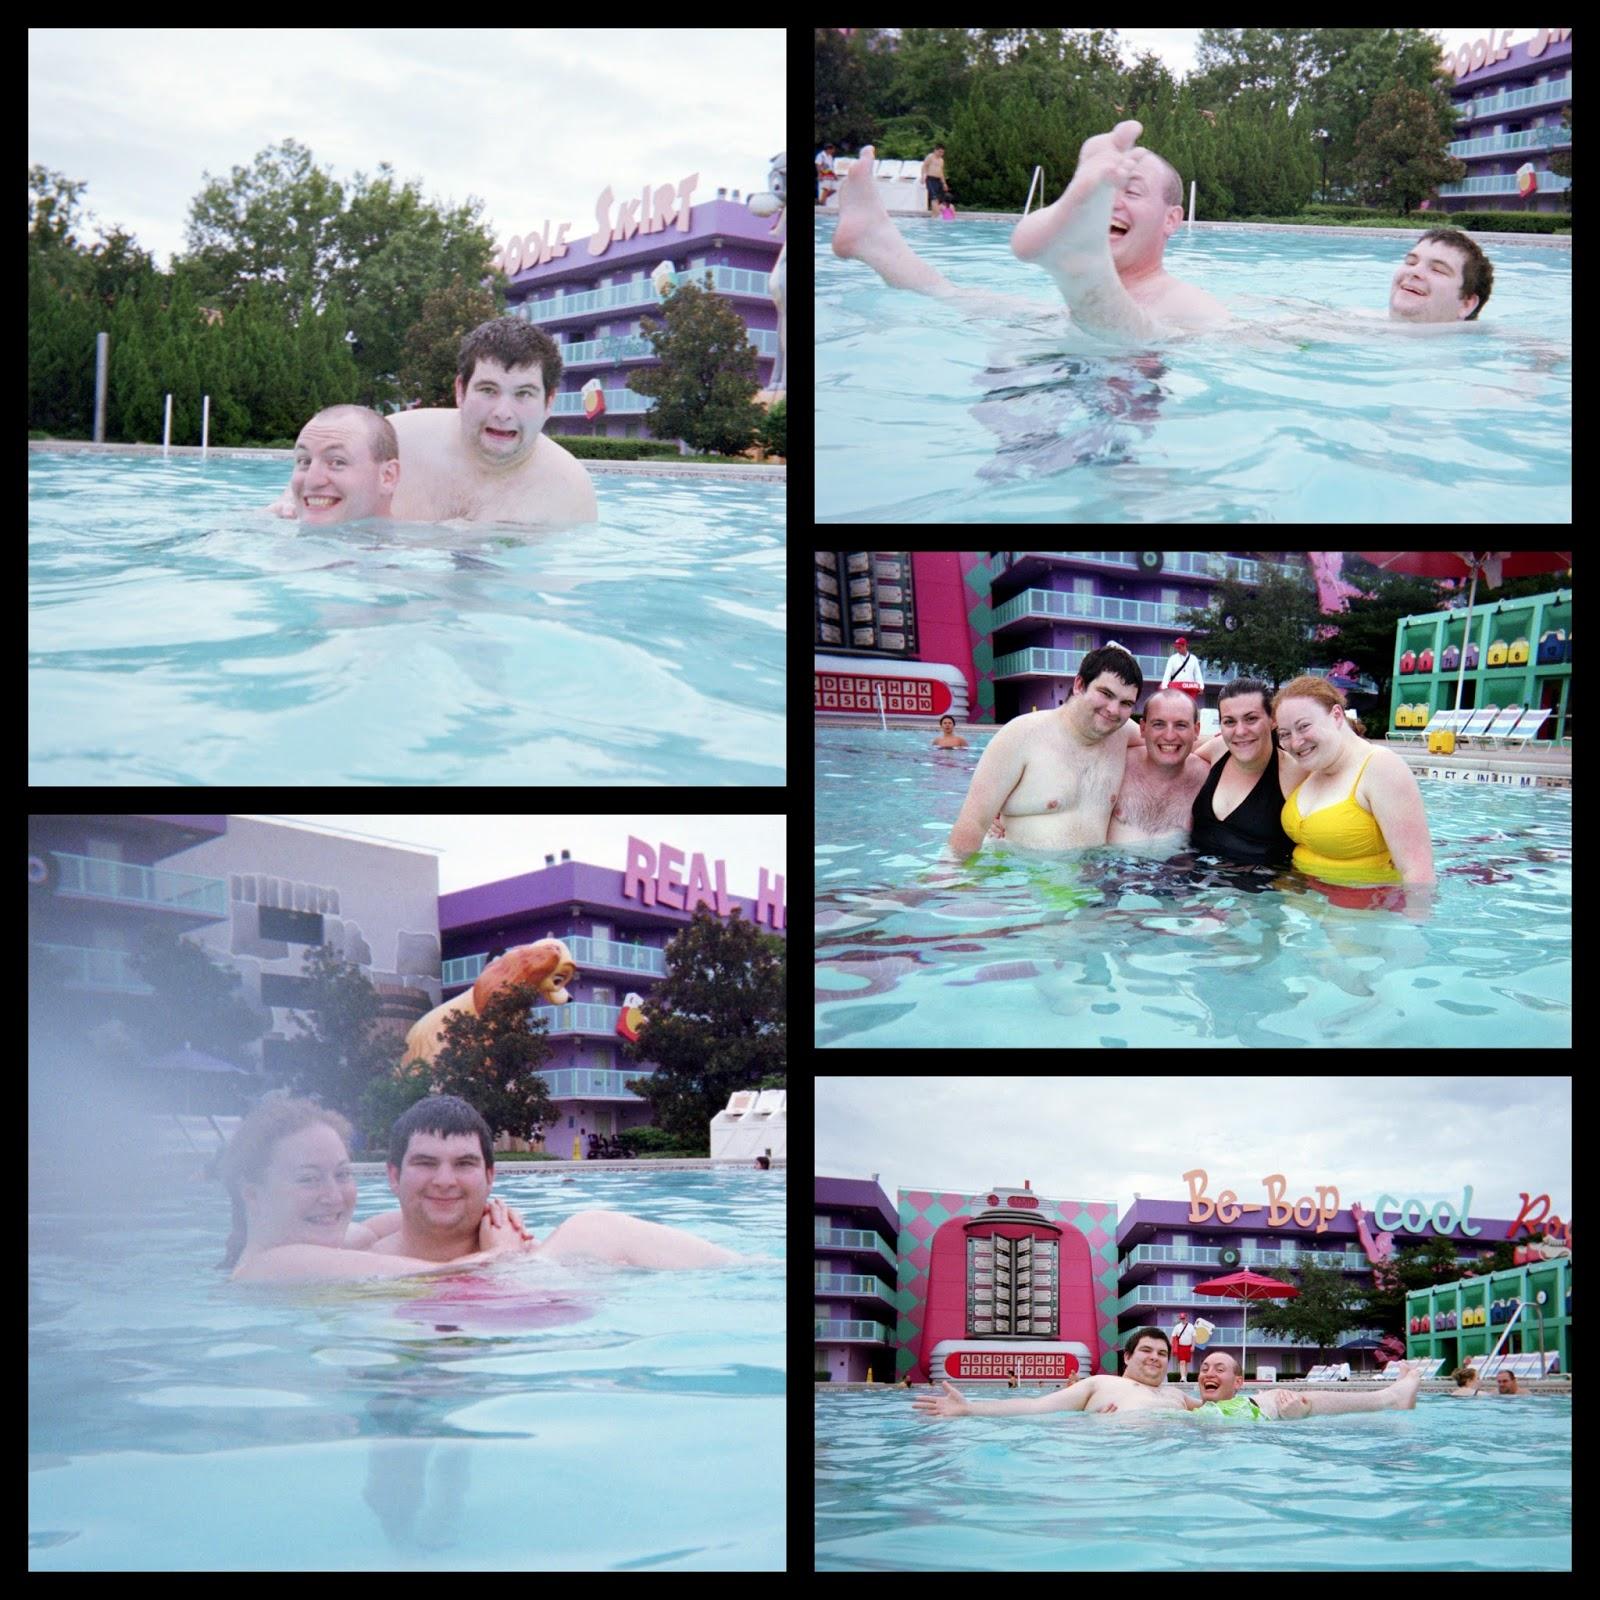 My disney life wedding trip recap september 15 2012 for Life of pi swimming pool